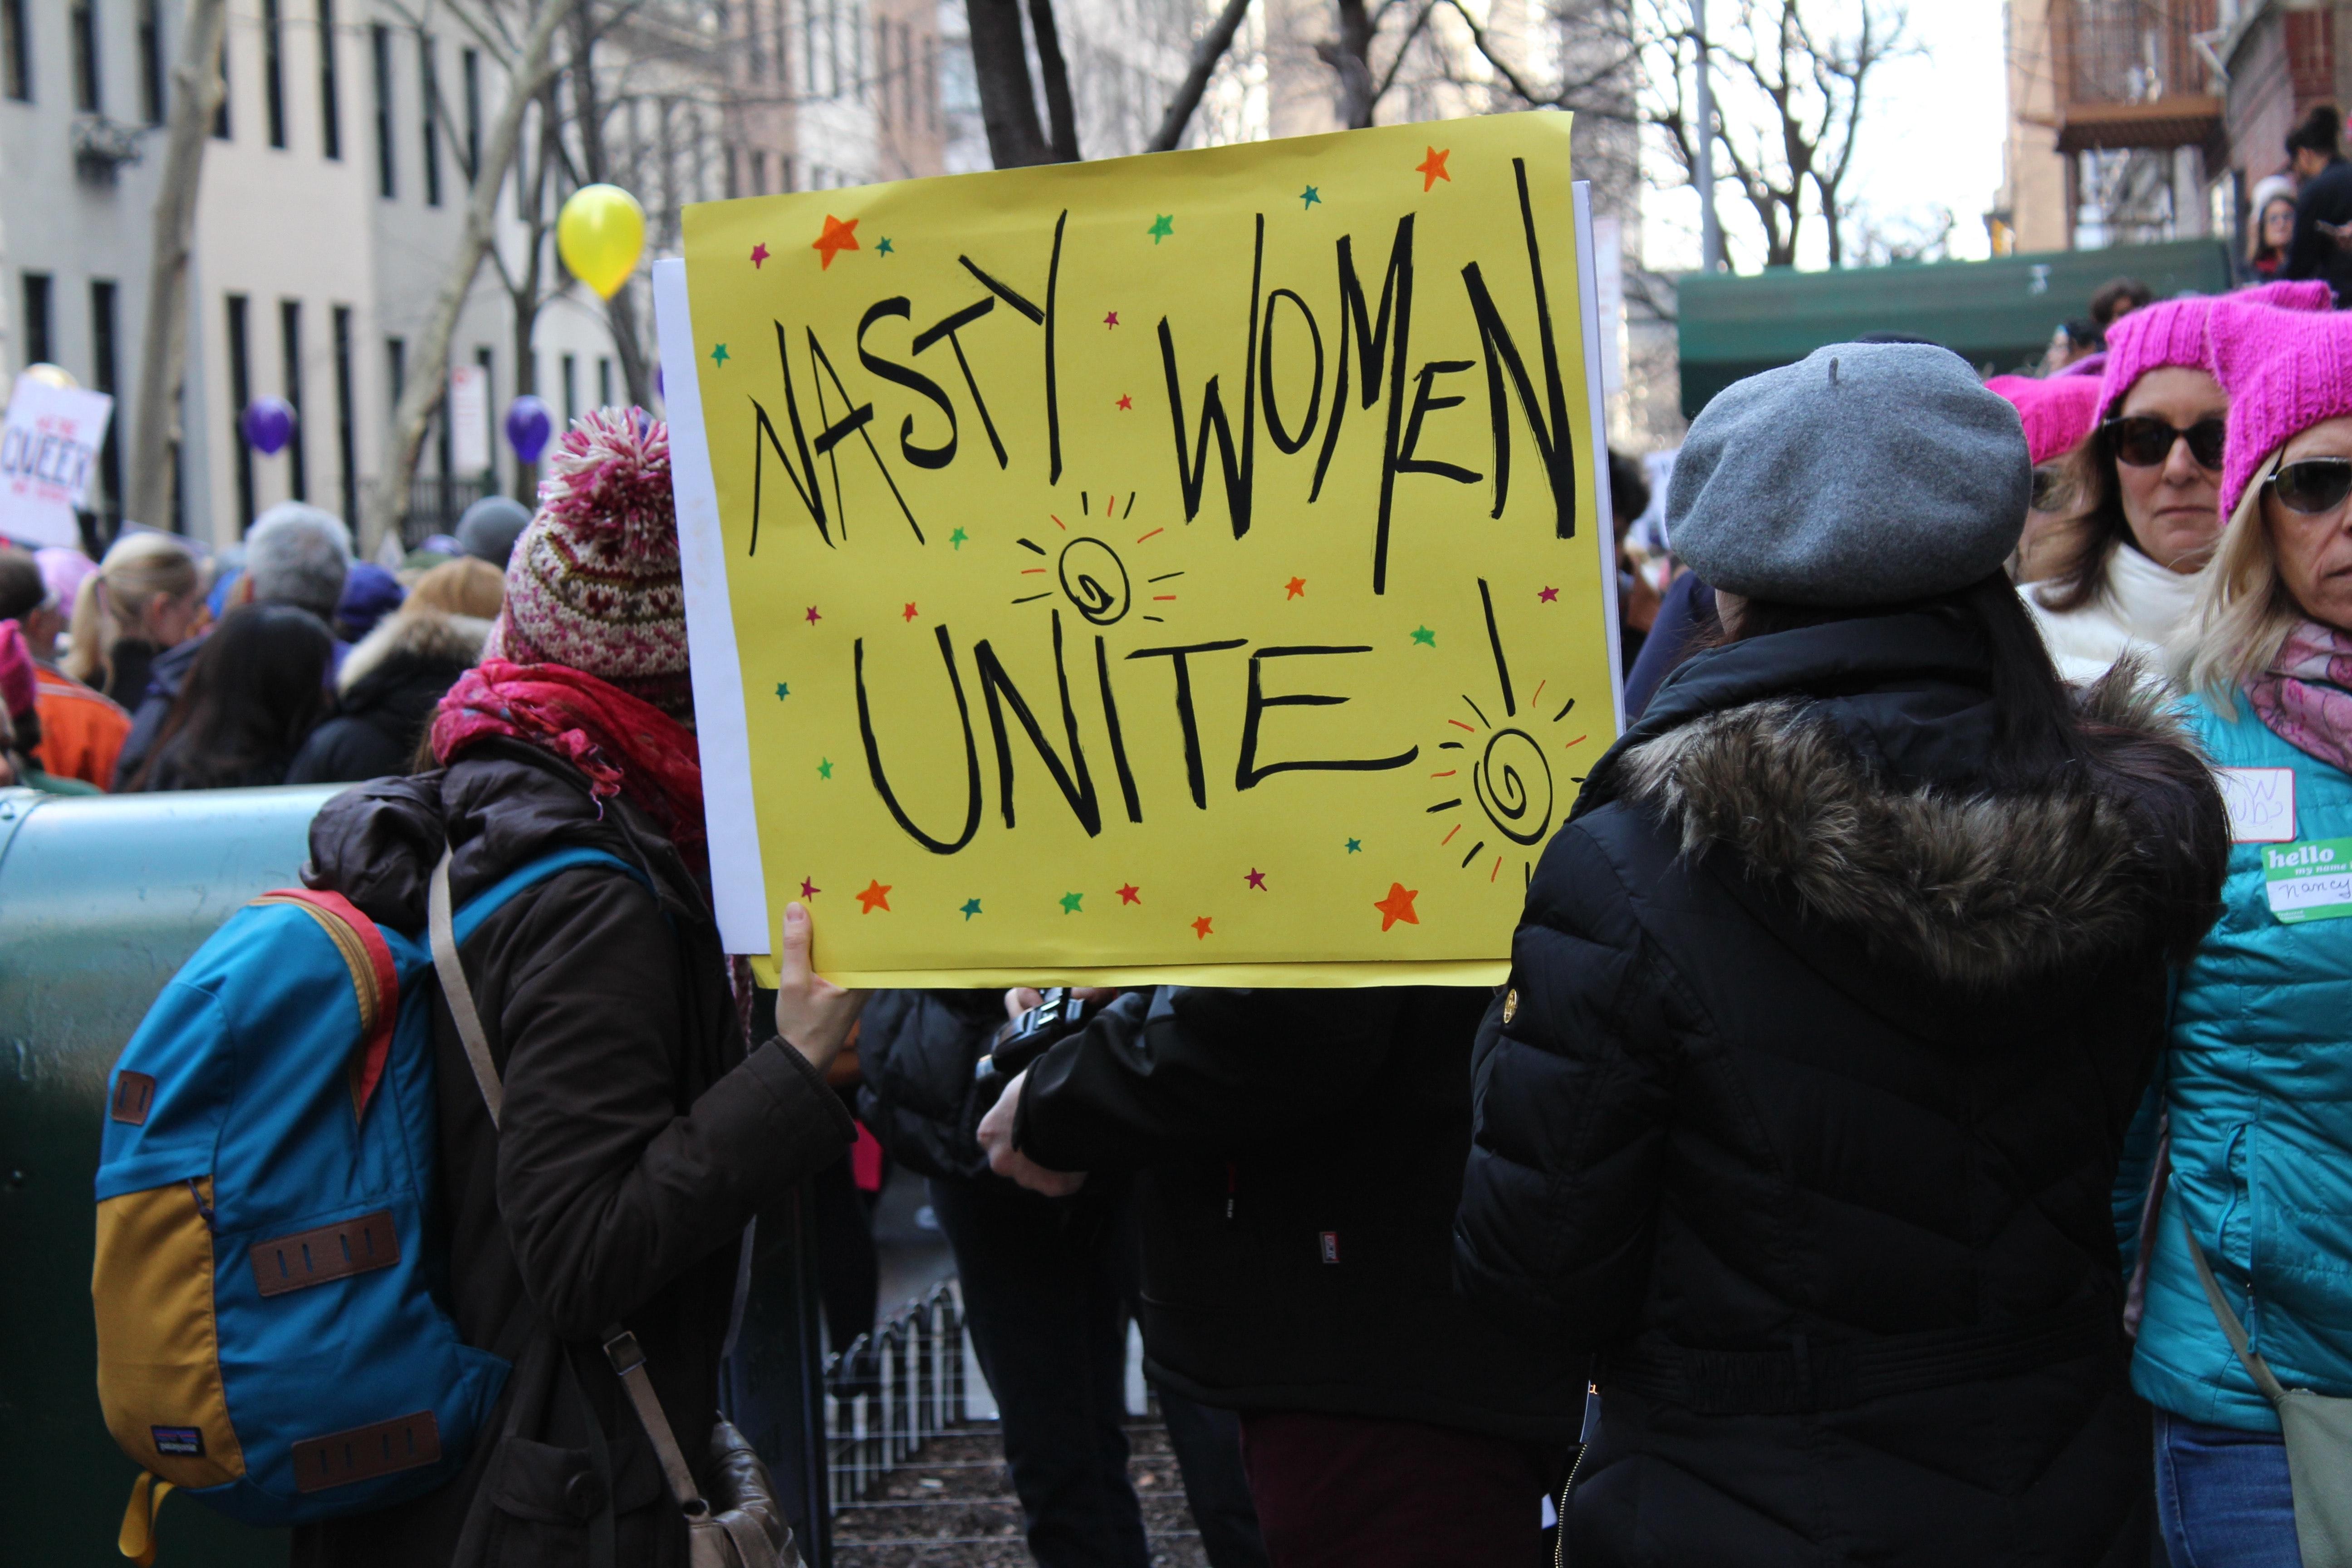 Women's March Photo by Monica Melton on Unsplash